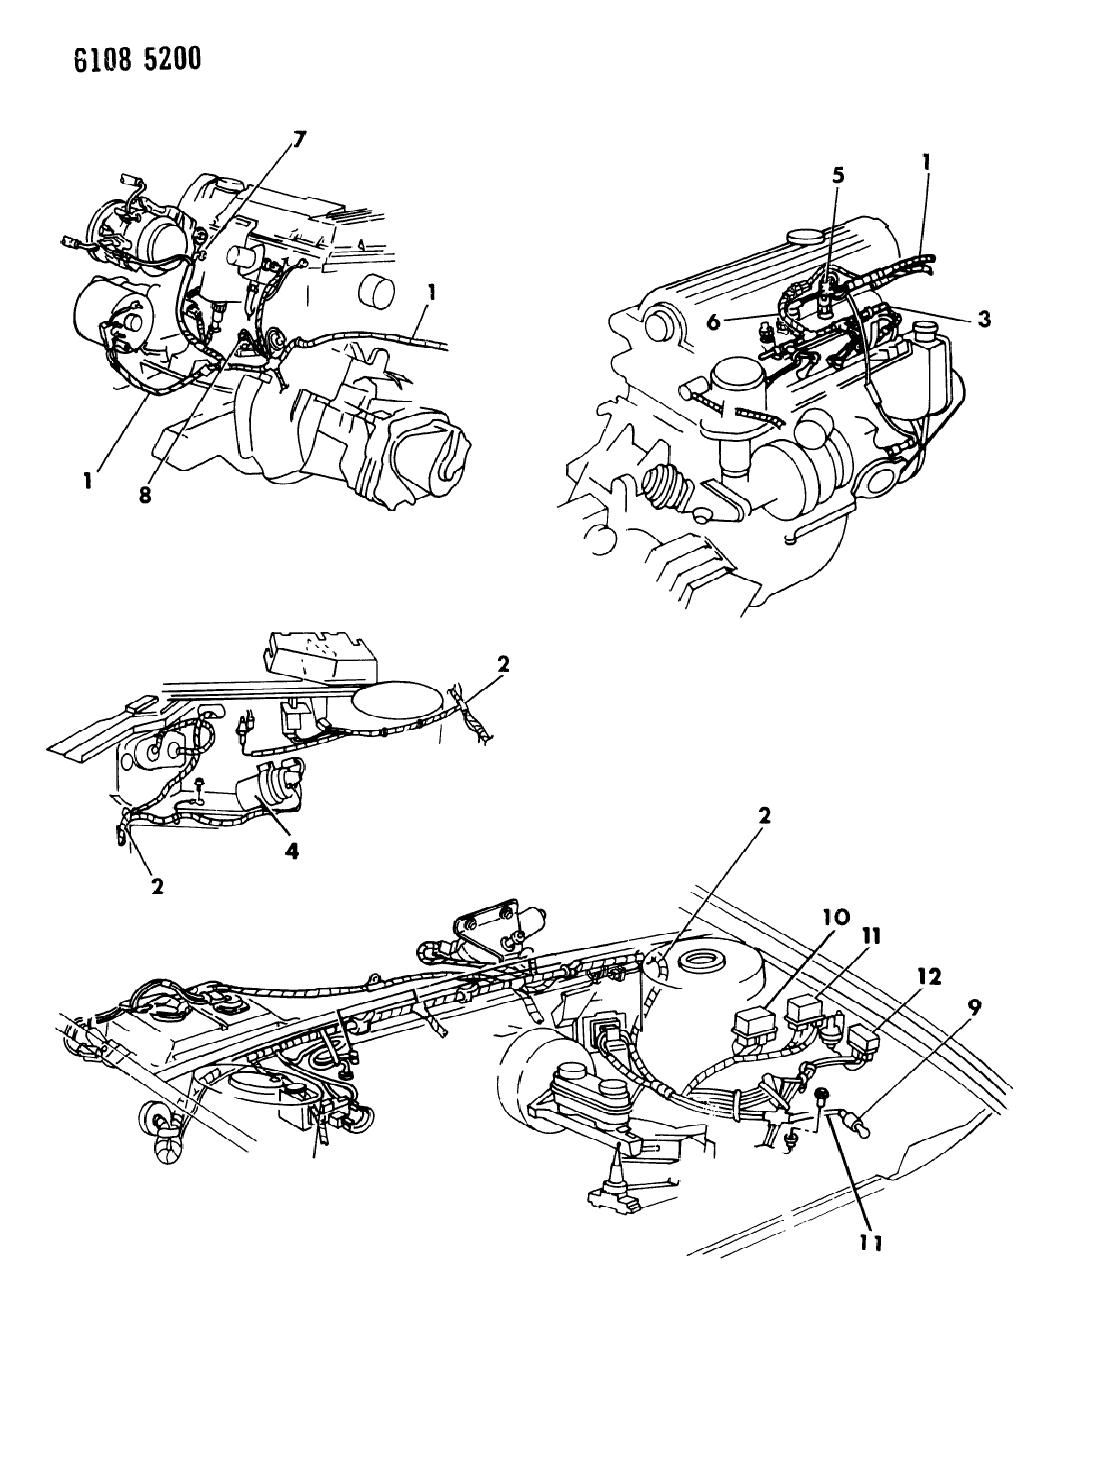 1989 Chrysler Lebaron Auto Wiring Diagram Schematic